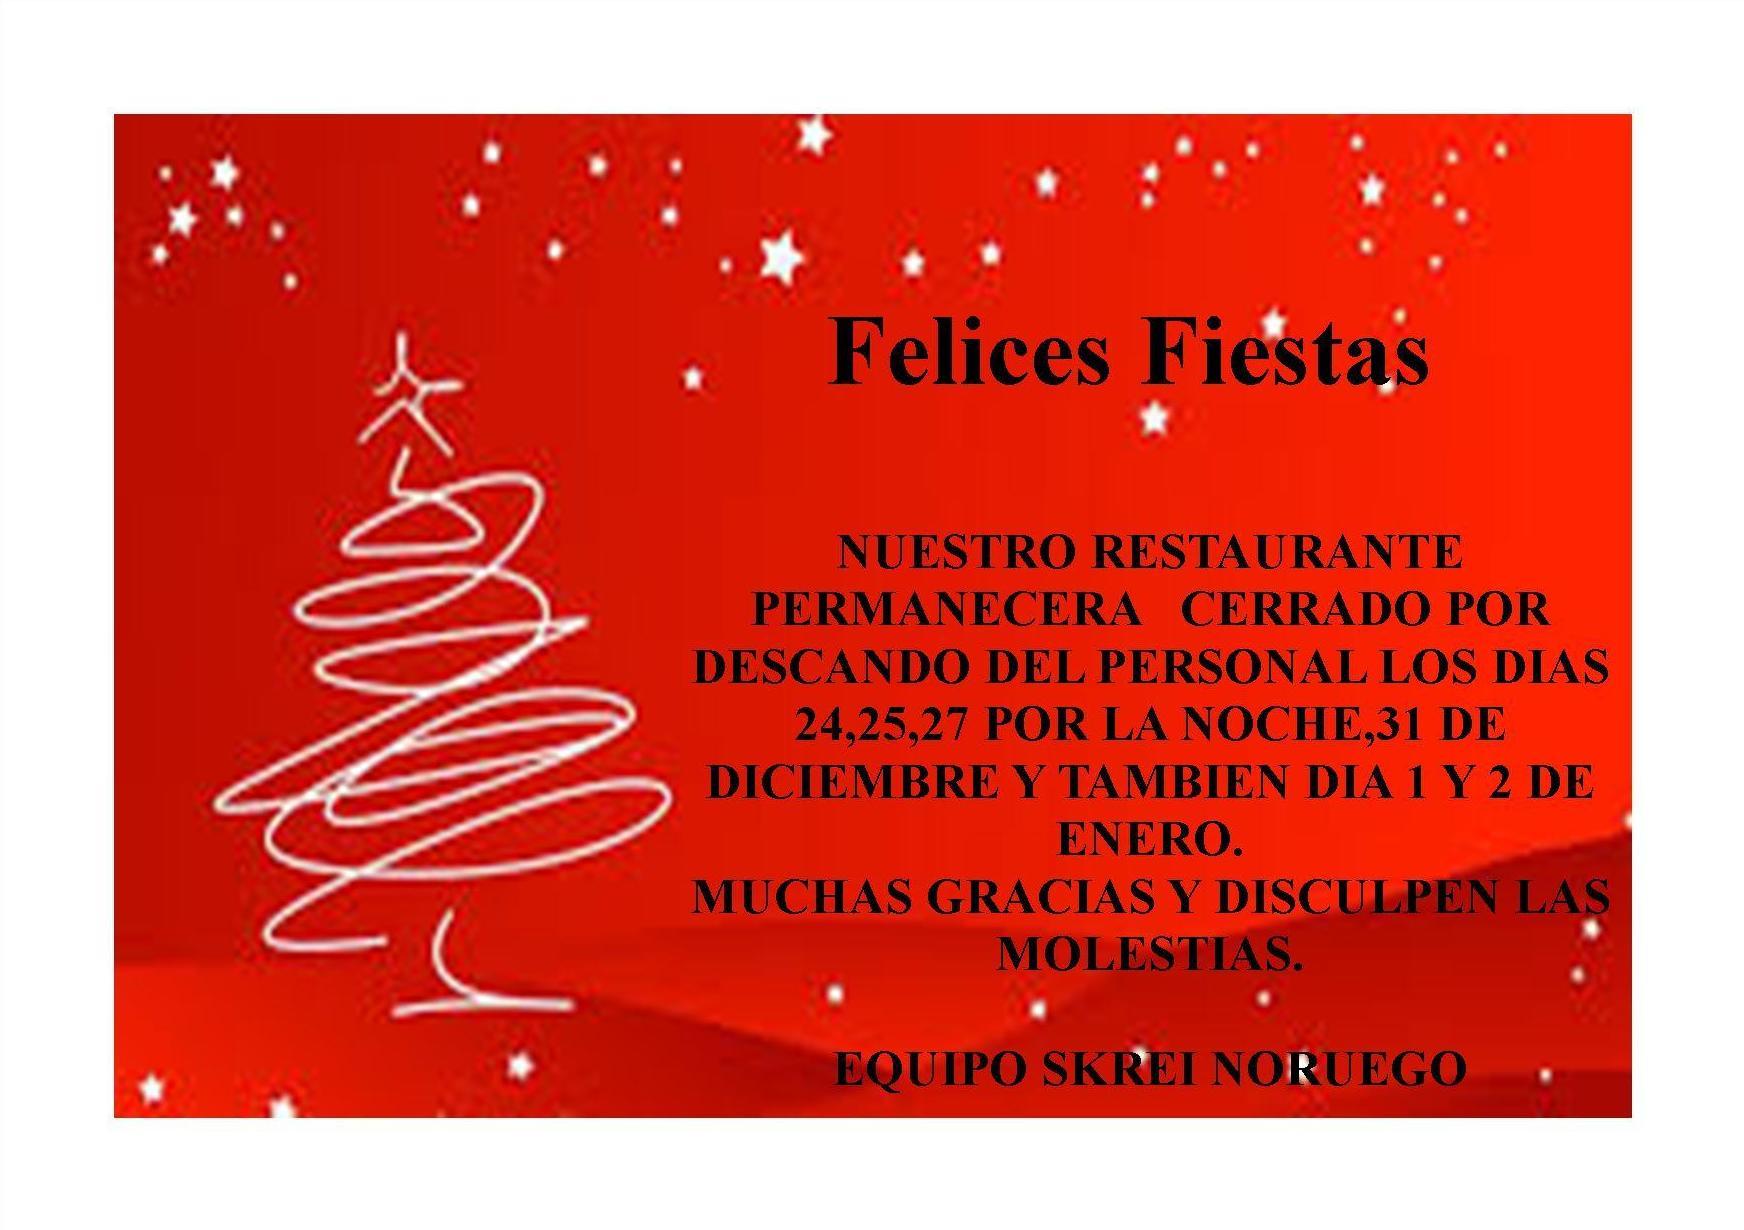 Felices Fiestas!!!